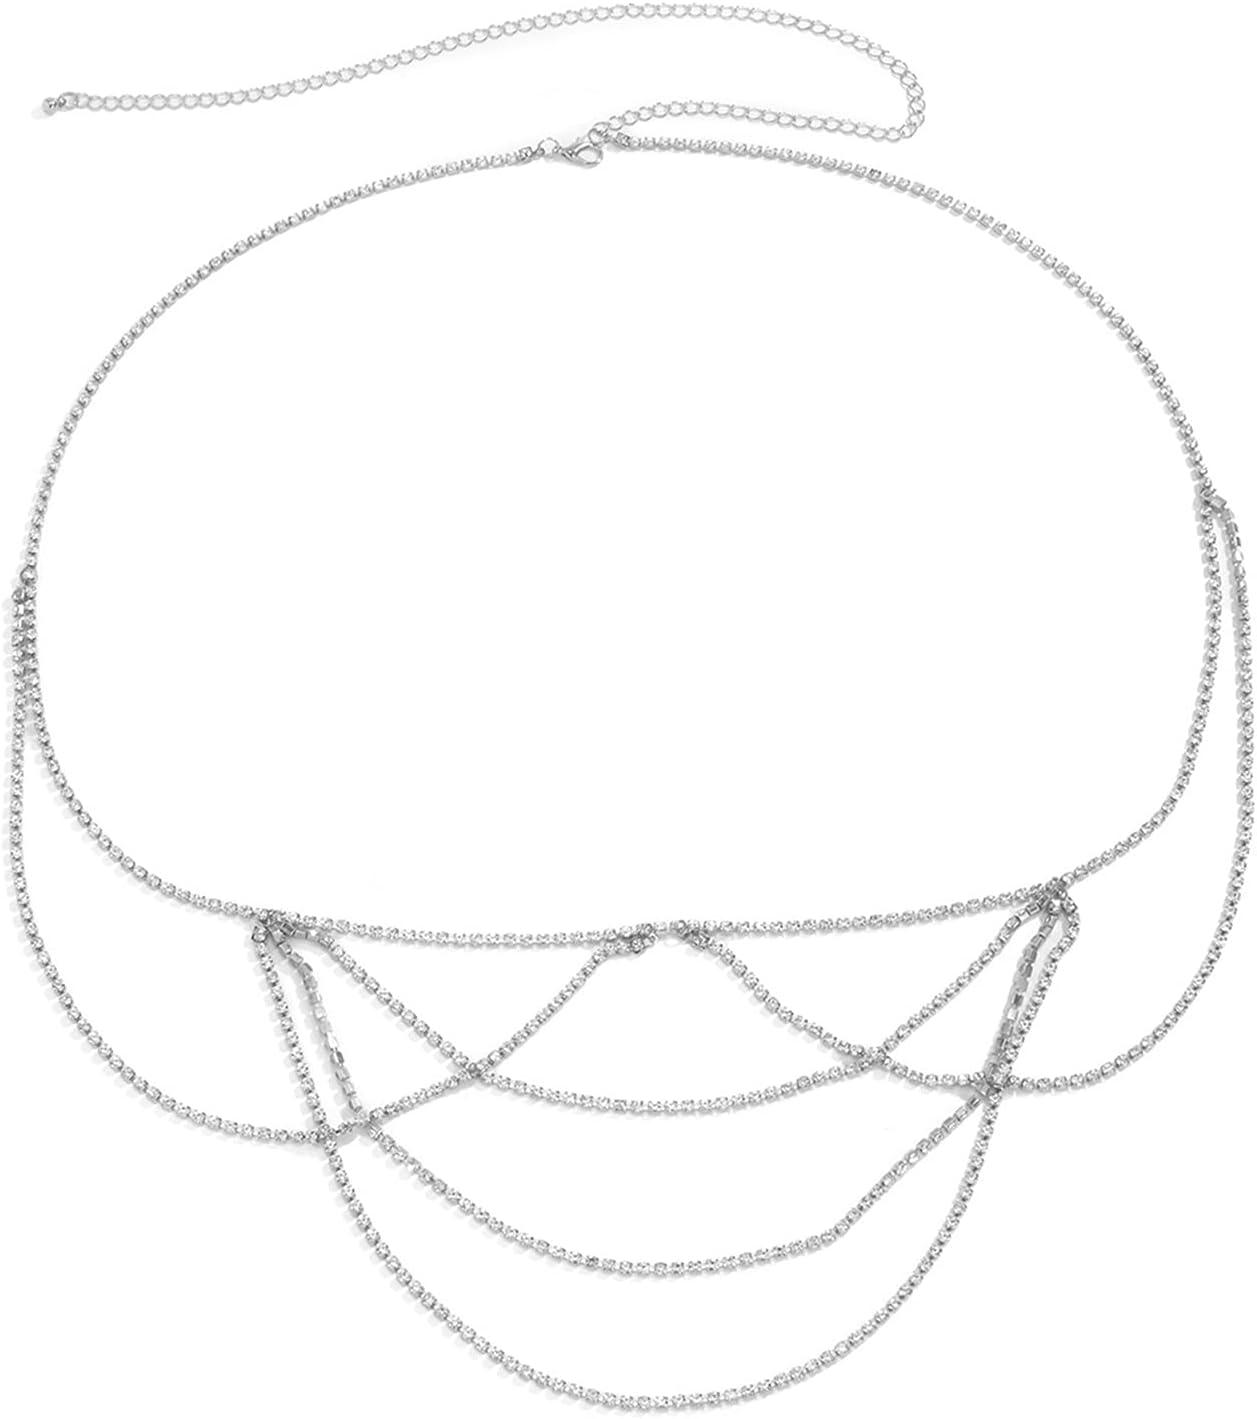 ZHU-CL Bikini Body Chain 5 ☆ San Antonio Mall popular Shining Woman Belly Rhin Chains U-Shape